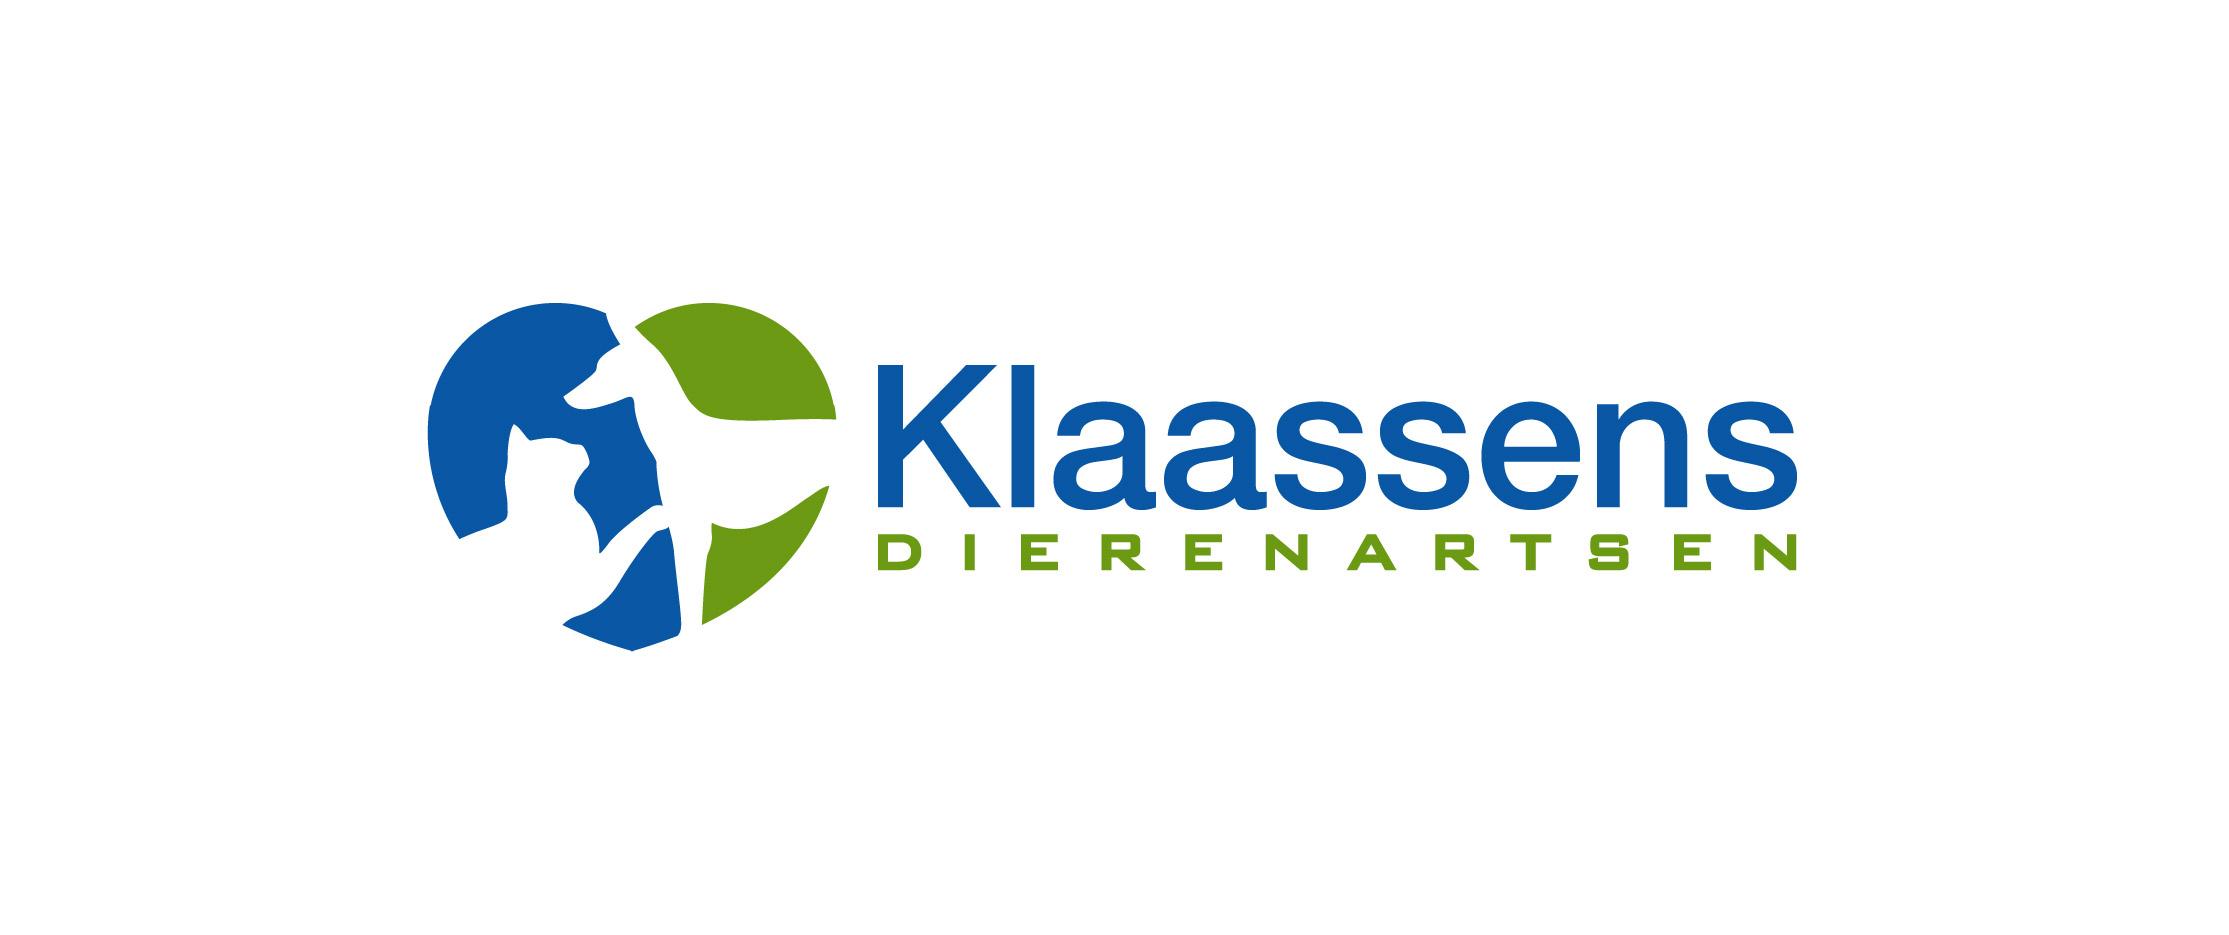 MC33M0a_Klaassens